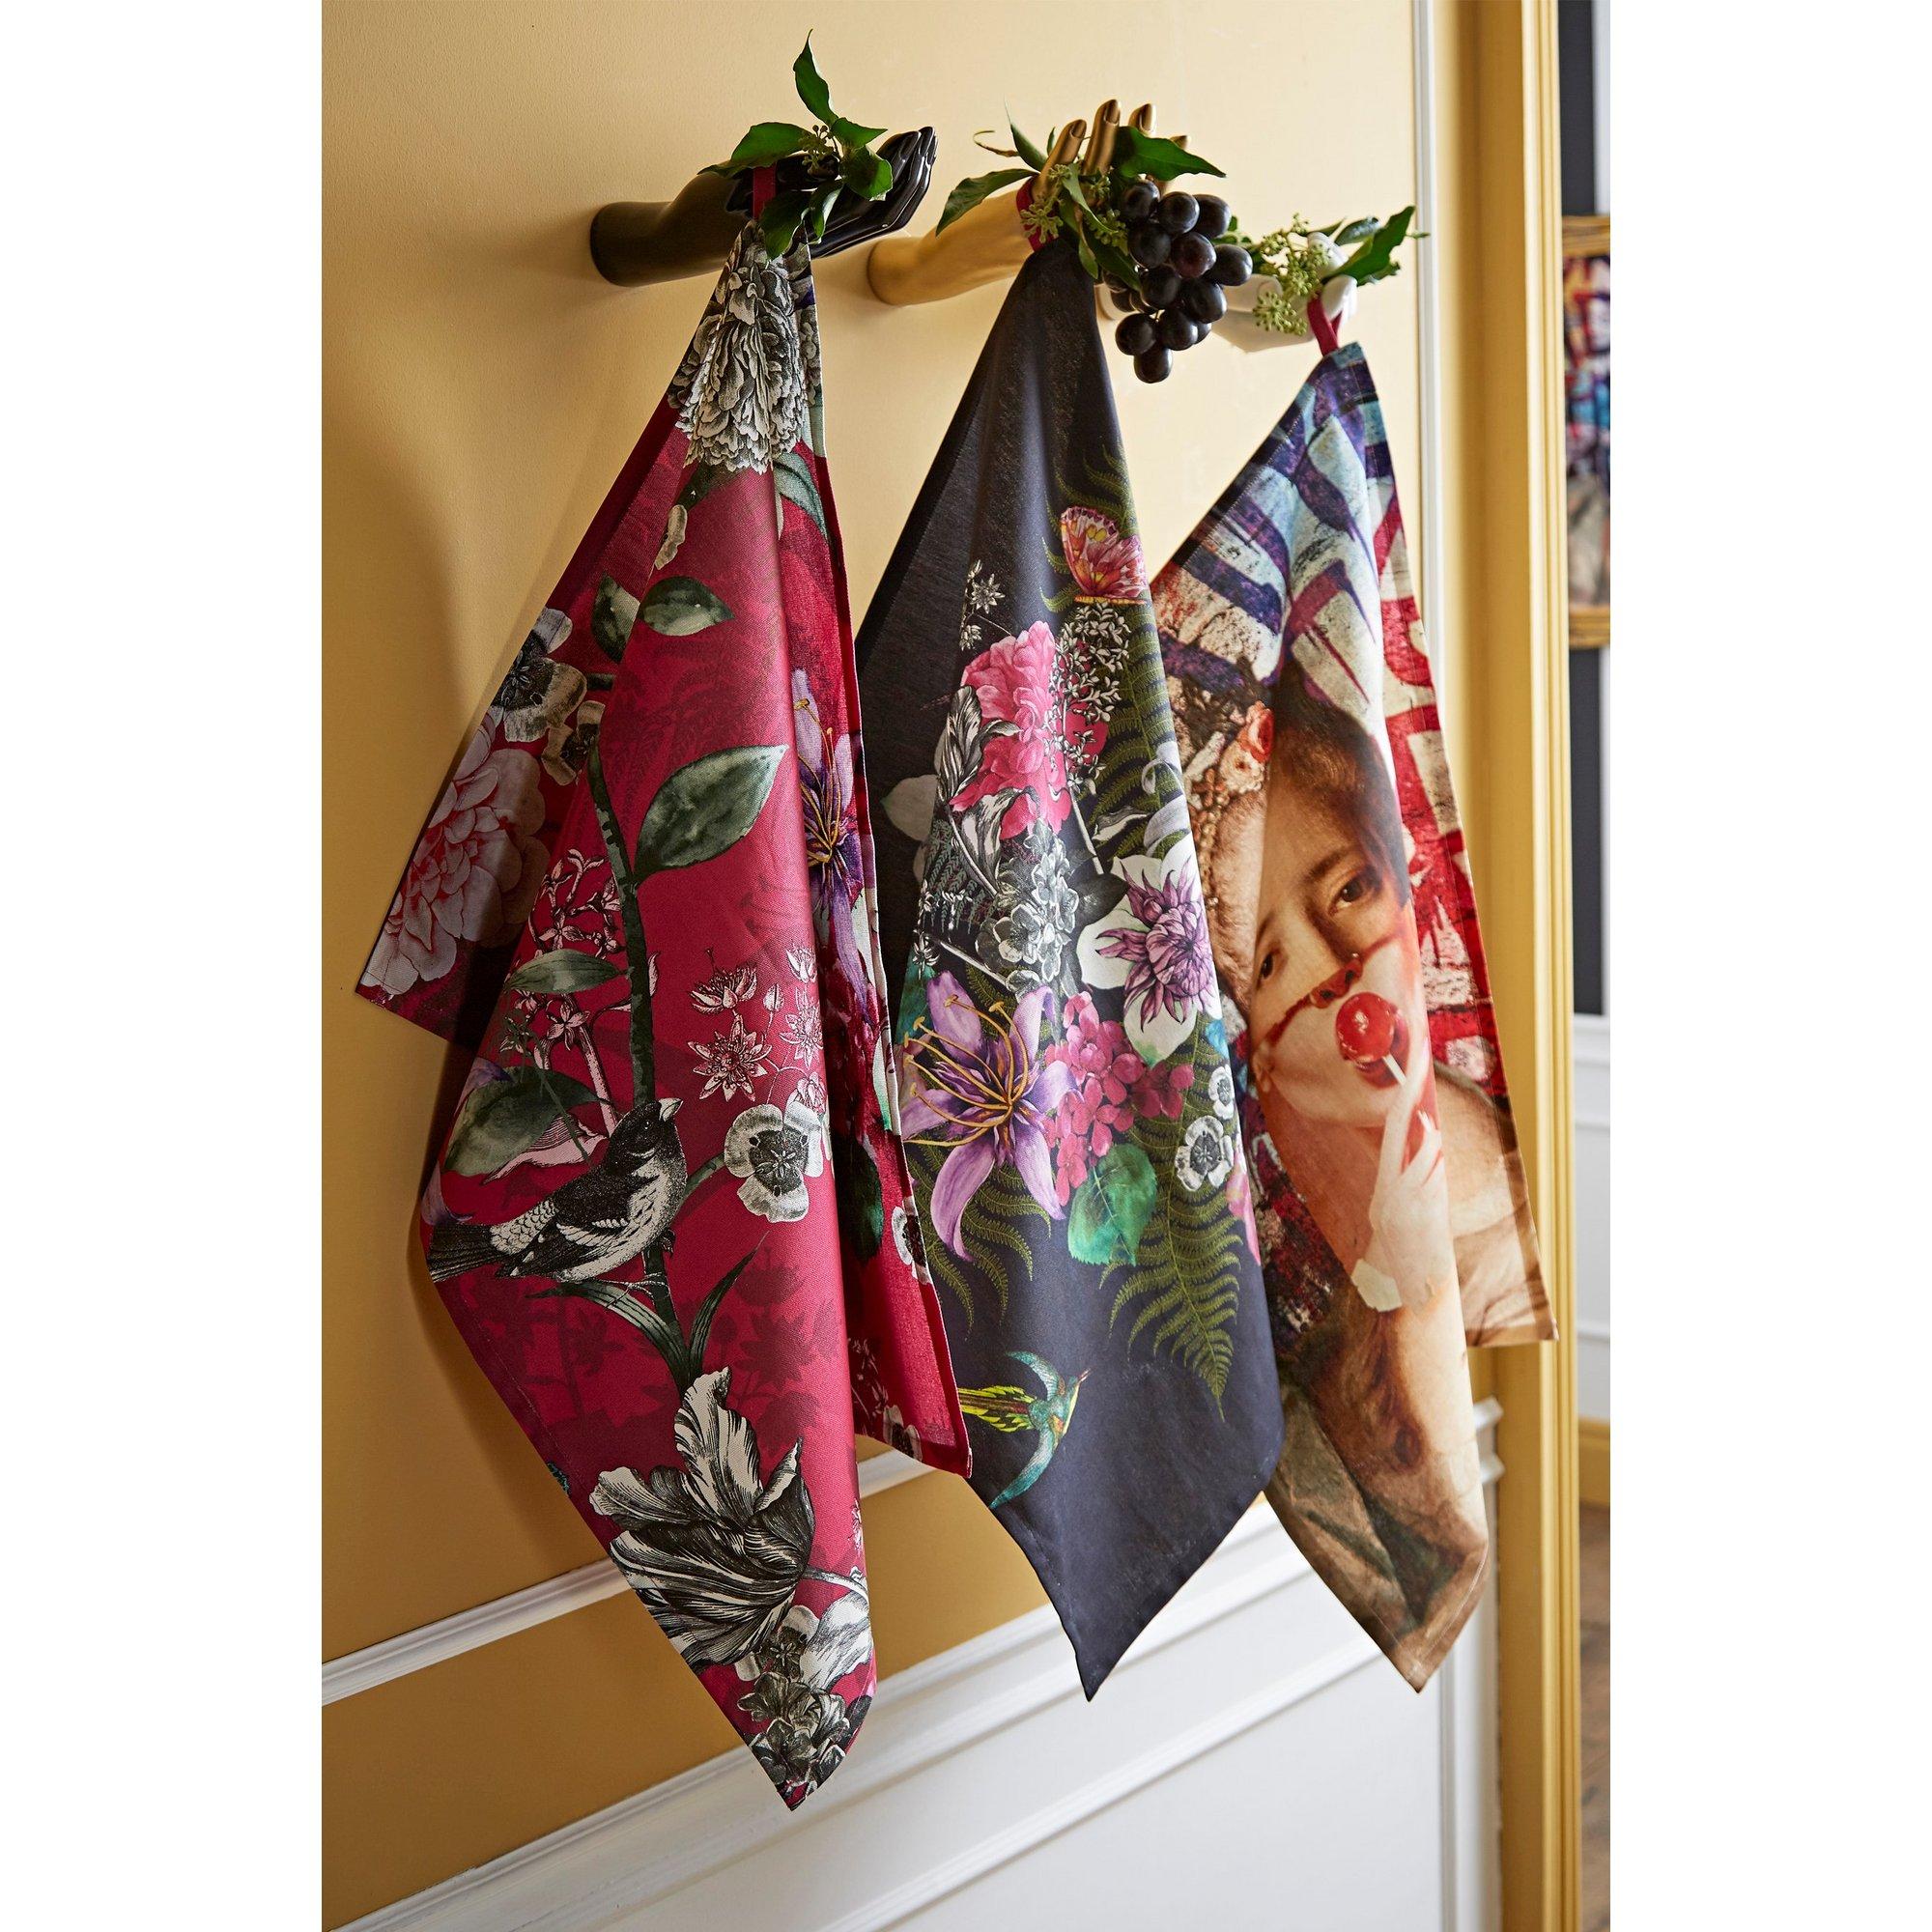 Image of Joe Brown History Clash Set of 3 Tea Towels